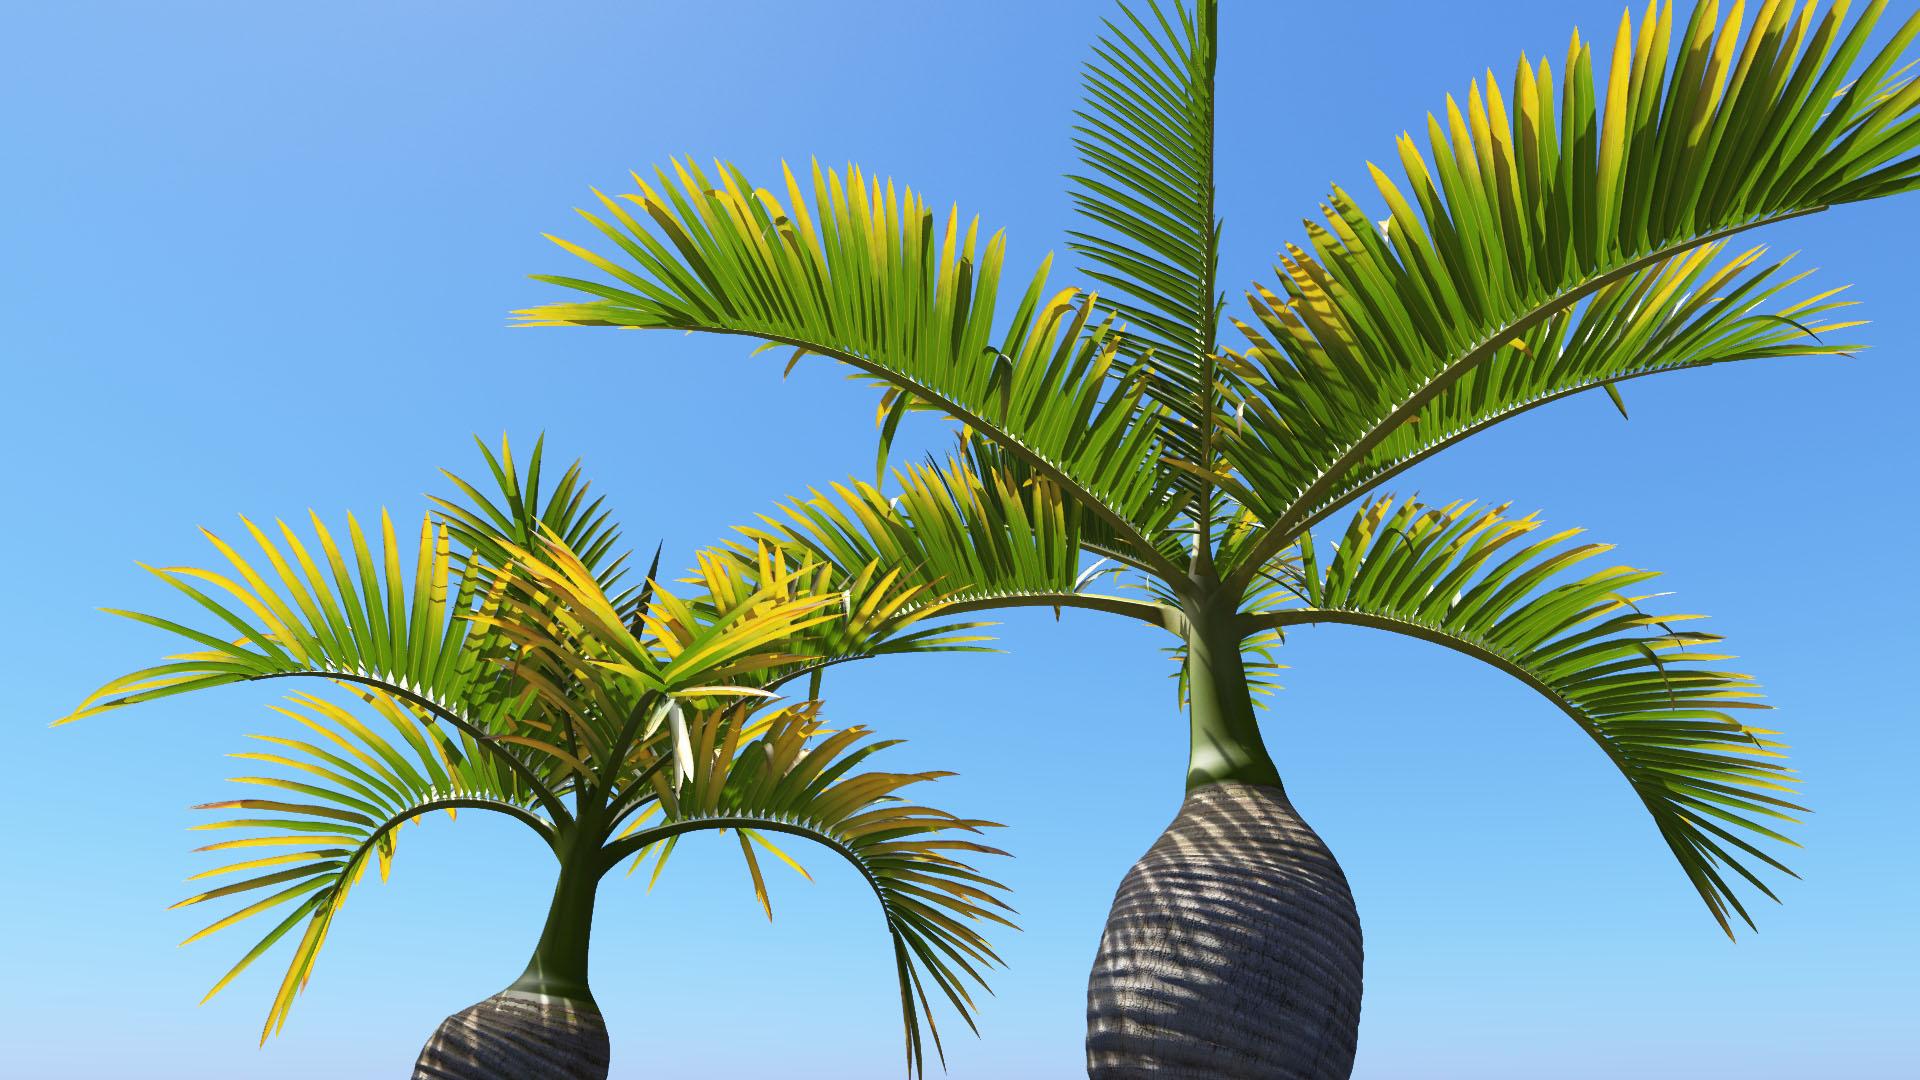 3D model of the Bottle palm Hyophorbe lagenicaulis close-up